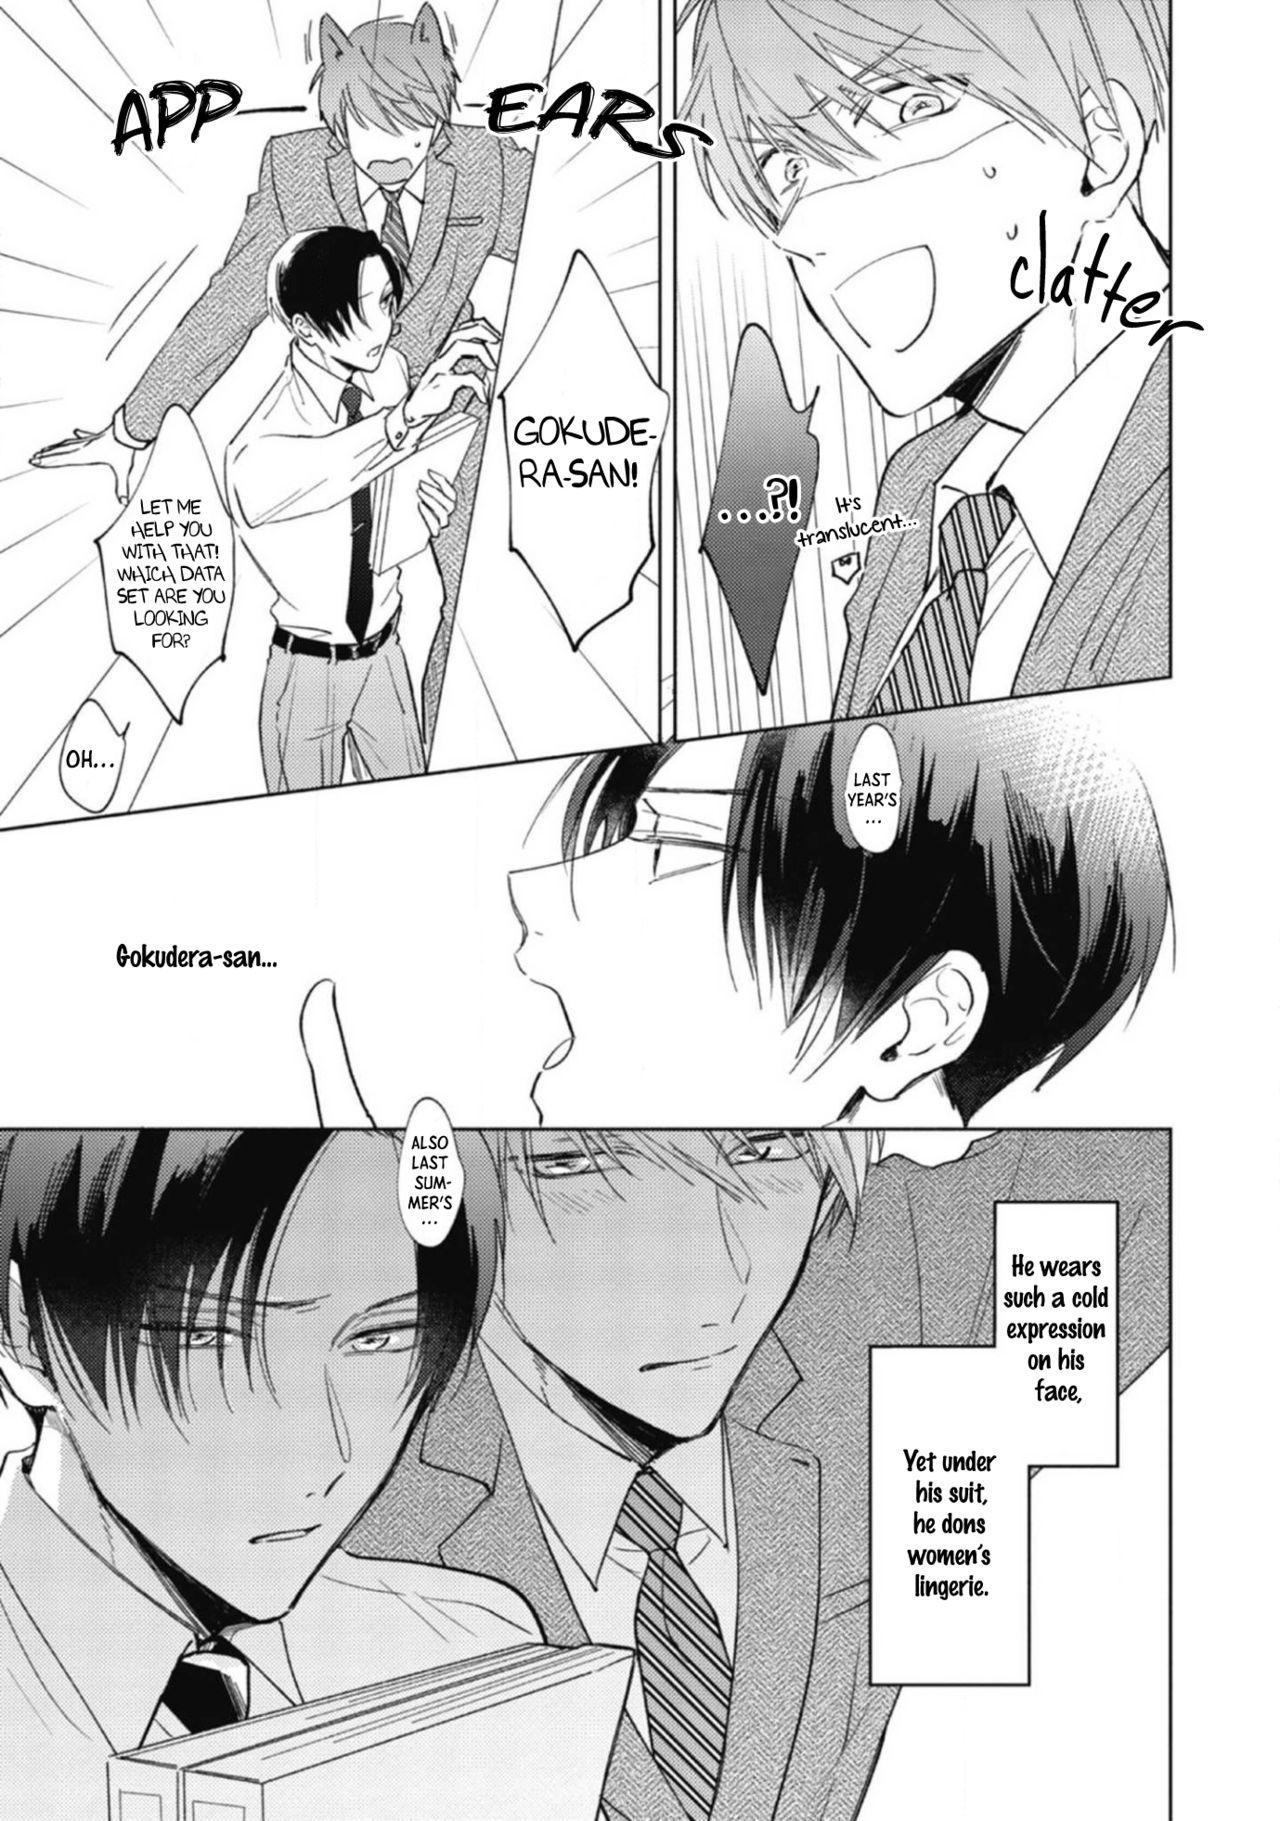 Oni Joushi Gokudera-san wa Abakaretai   My demon boss, Gokudera wants to be exposed 1 28